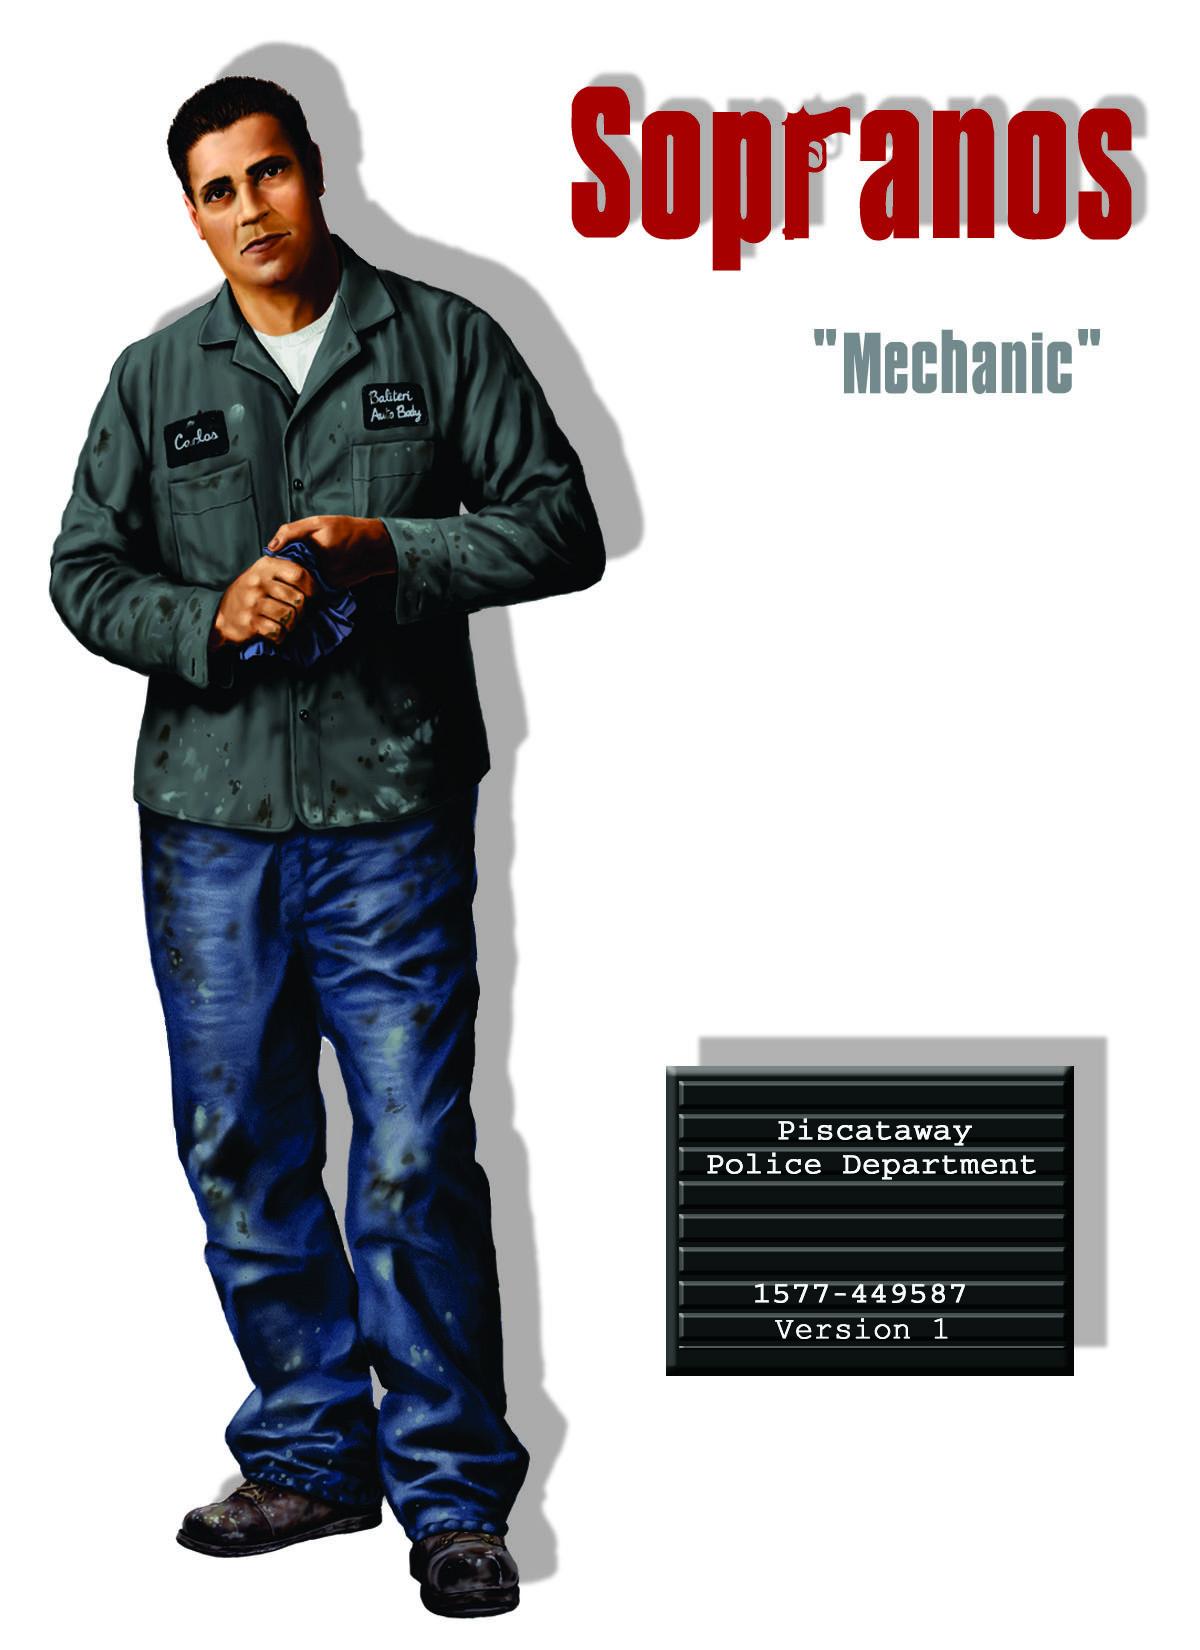 Jeff zugale sop npc mechanic concept 1